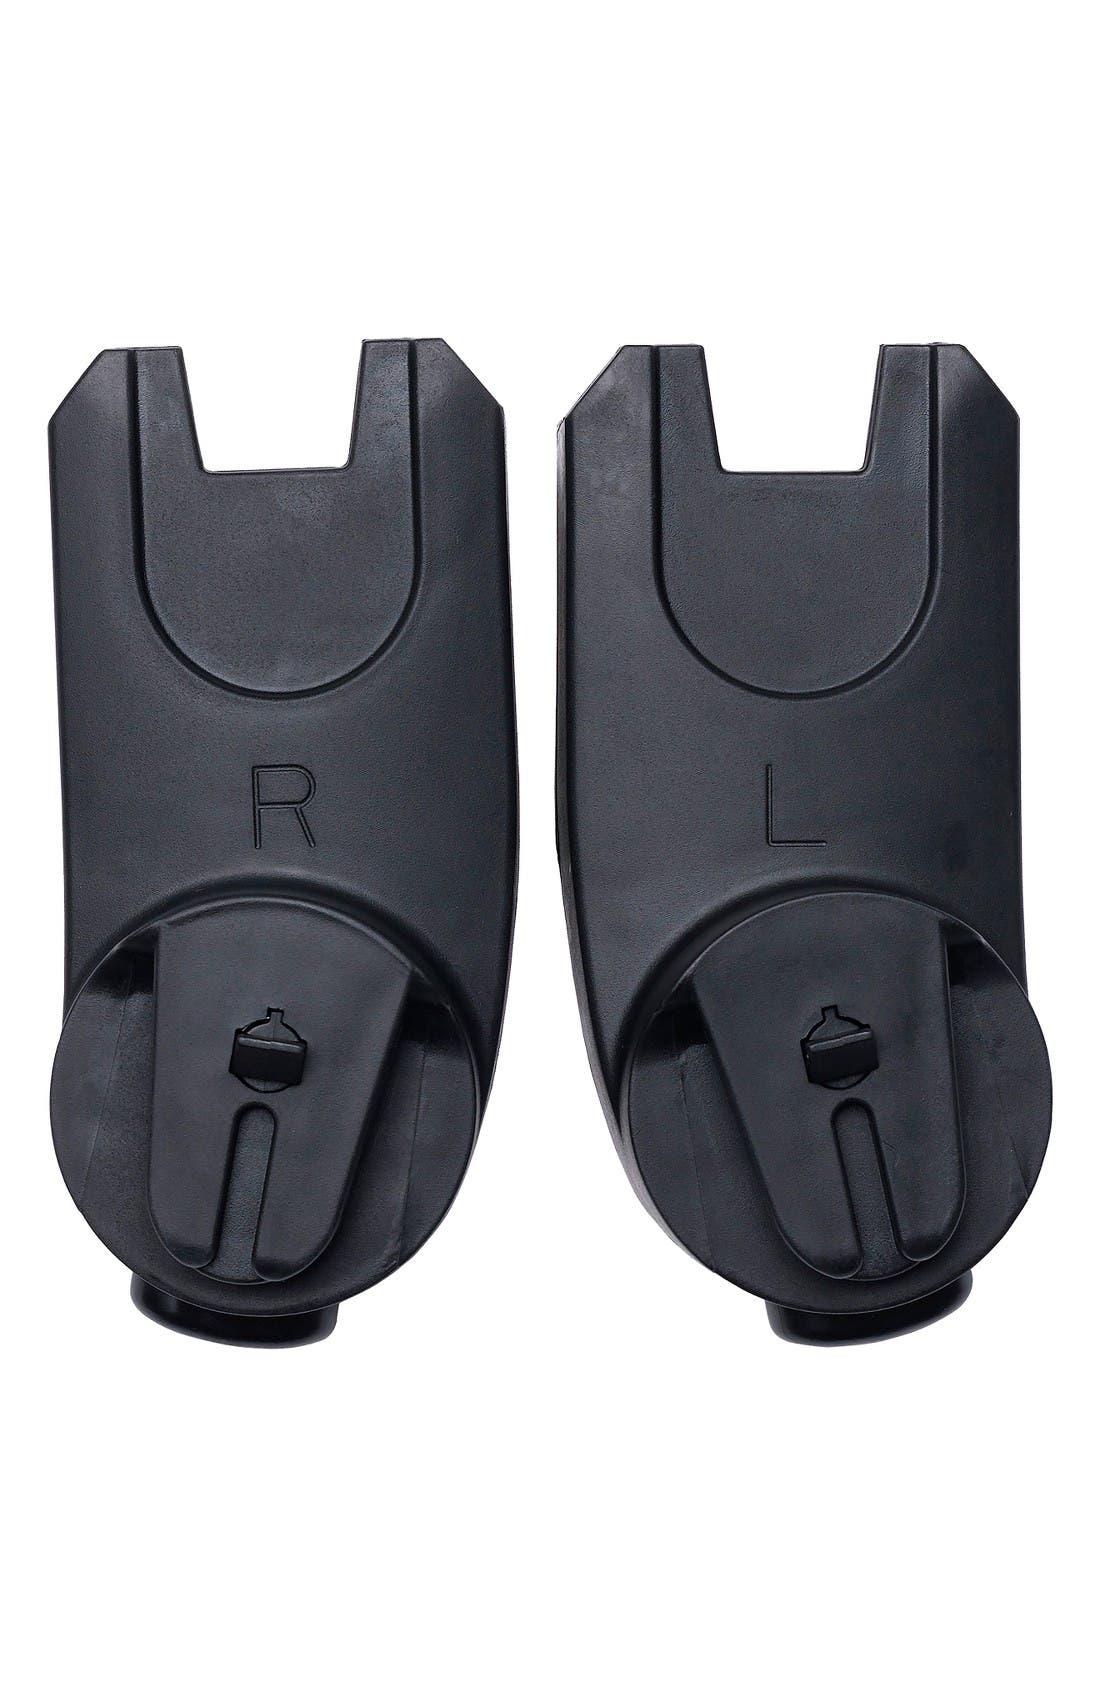 Car Seat Adaptor for Mima Xari Stroller and Maxi Cosi, Cybex & Nuna Car Seats,                         Main,                         color, BLACK